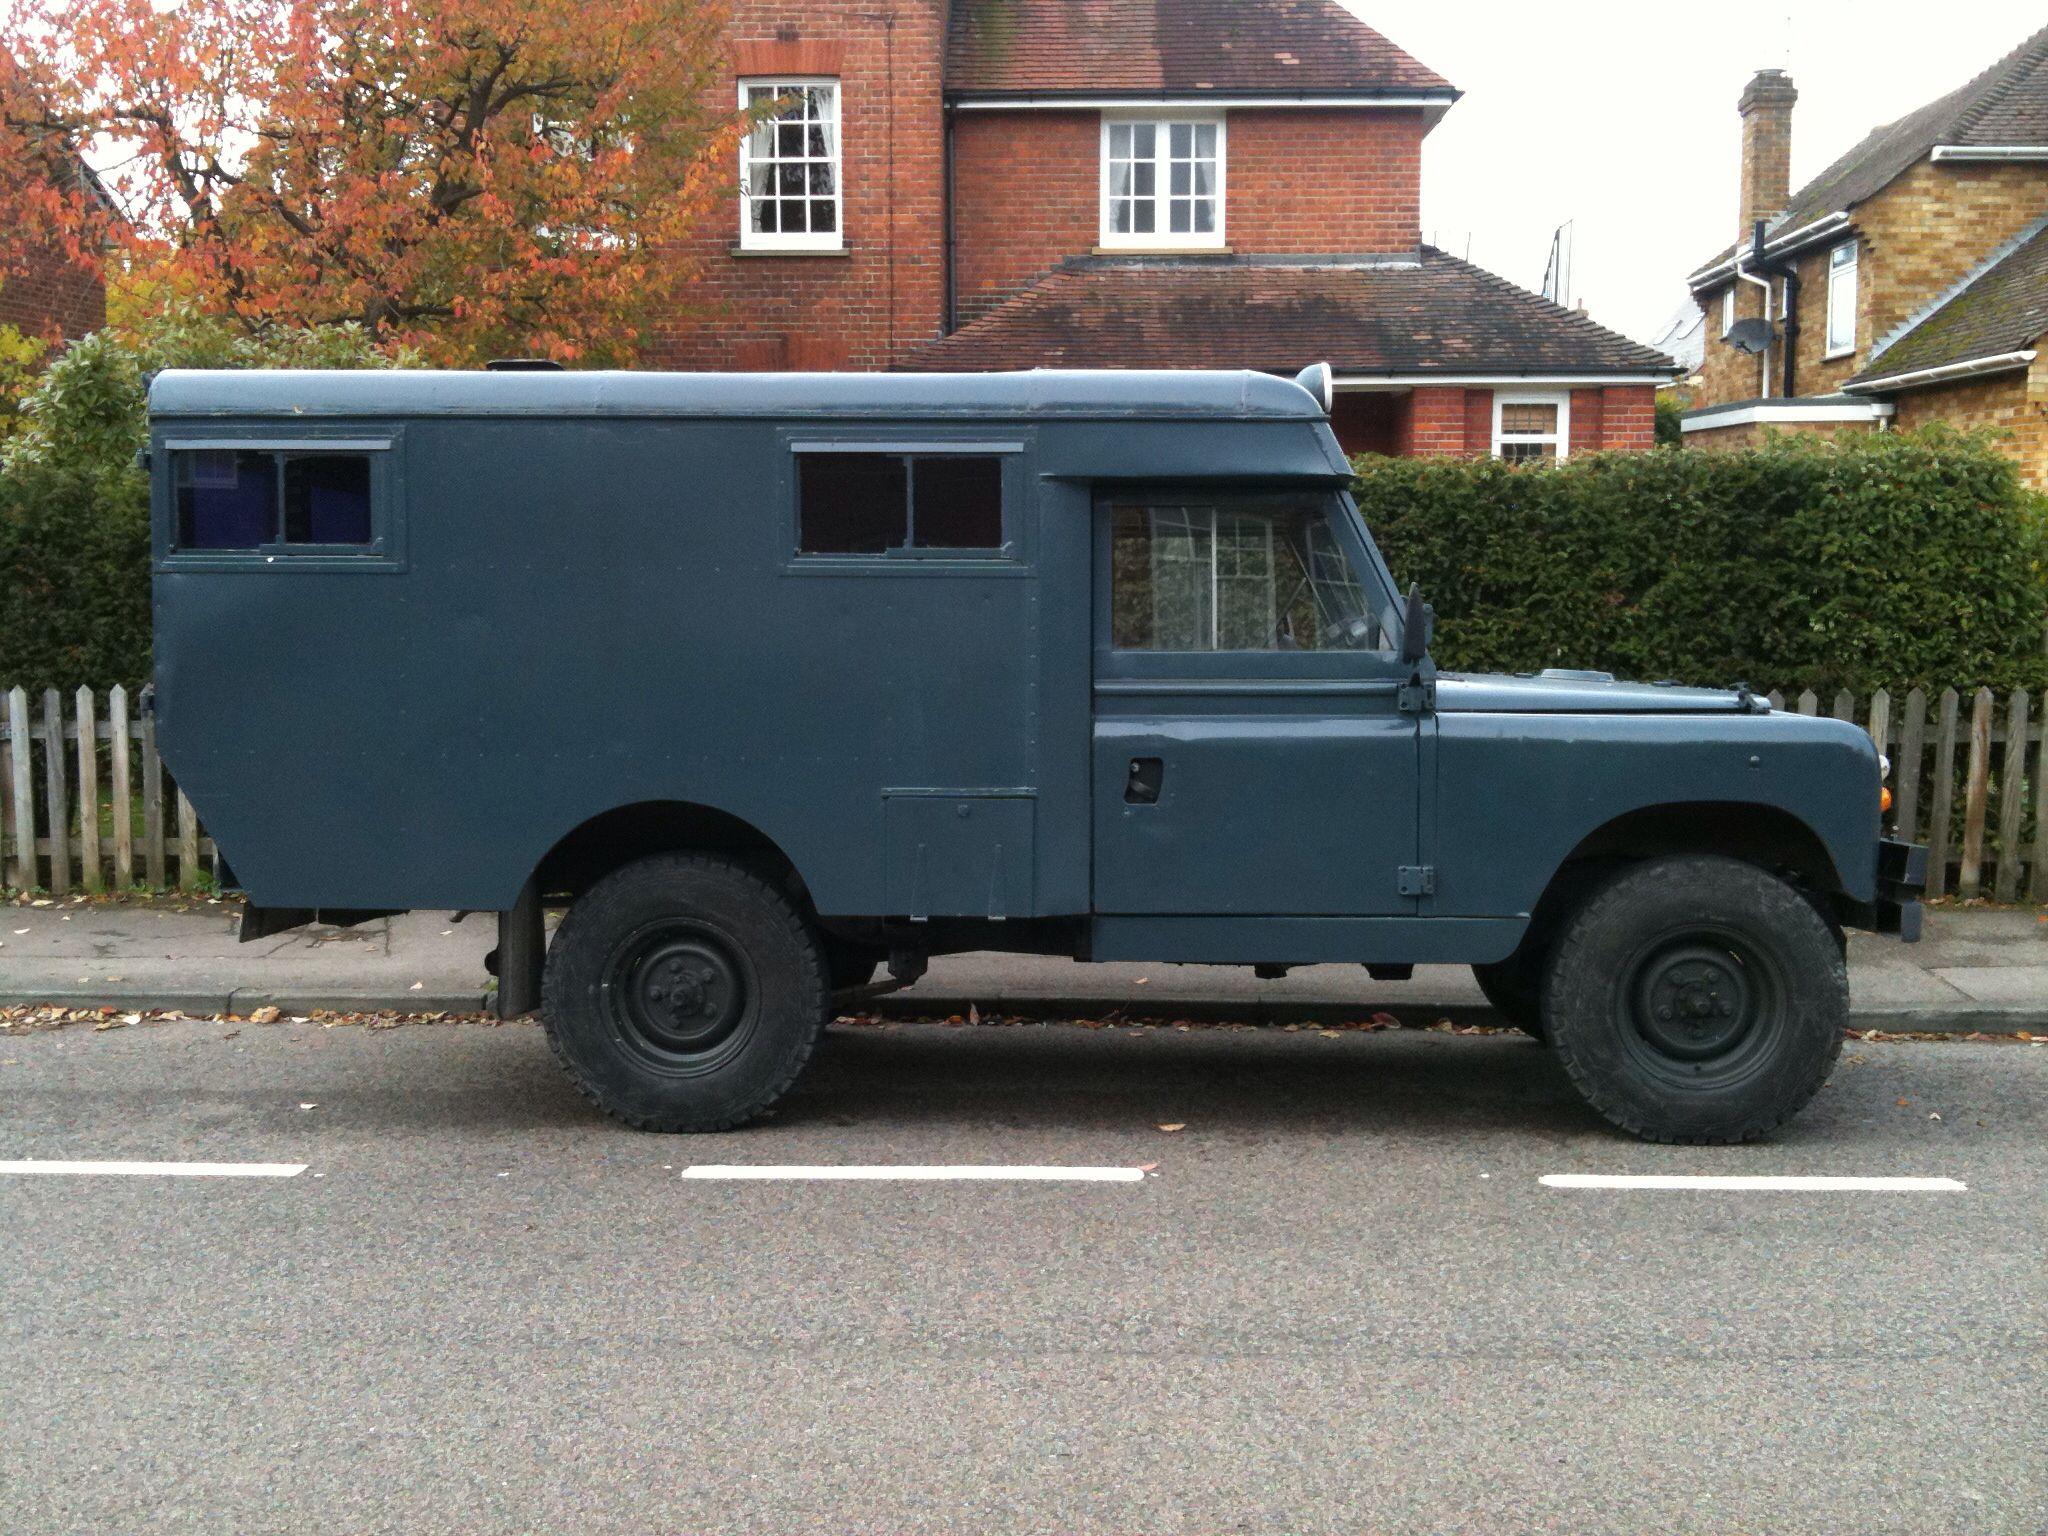 ◇1966 Series 2A Land Rover Ambulance◇ Maintenance restoration of